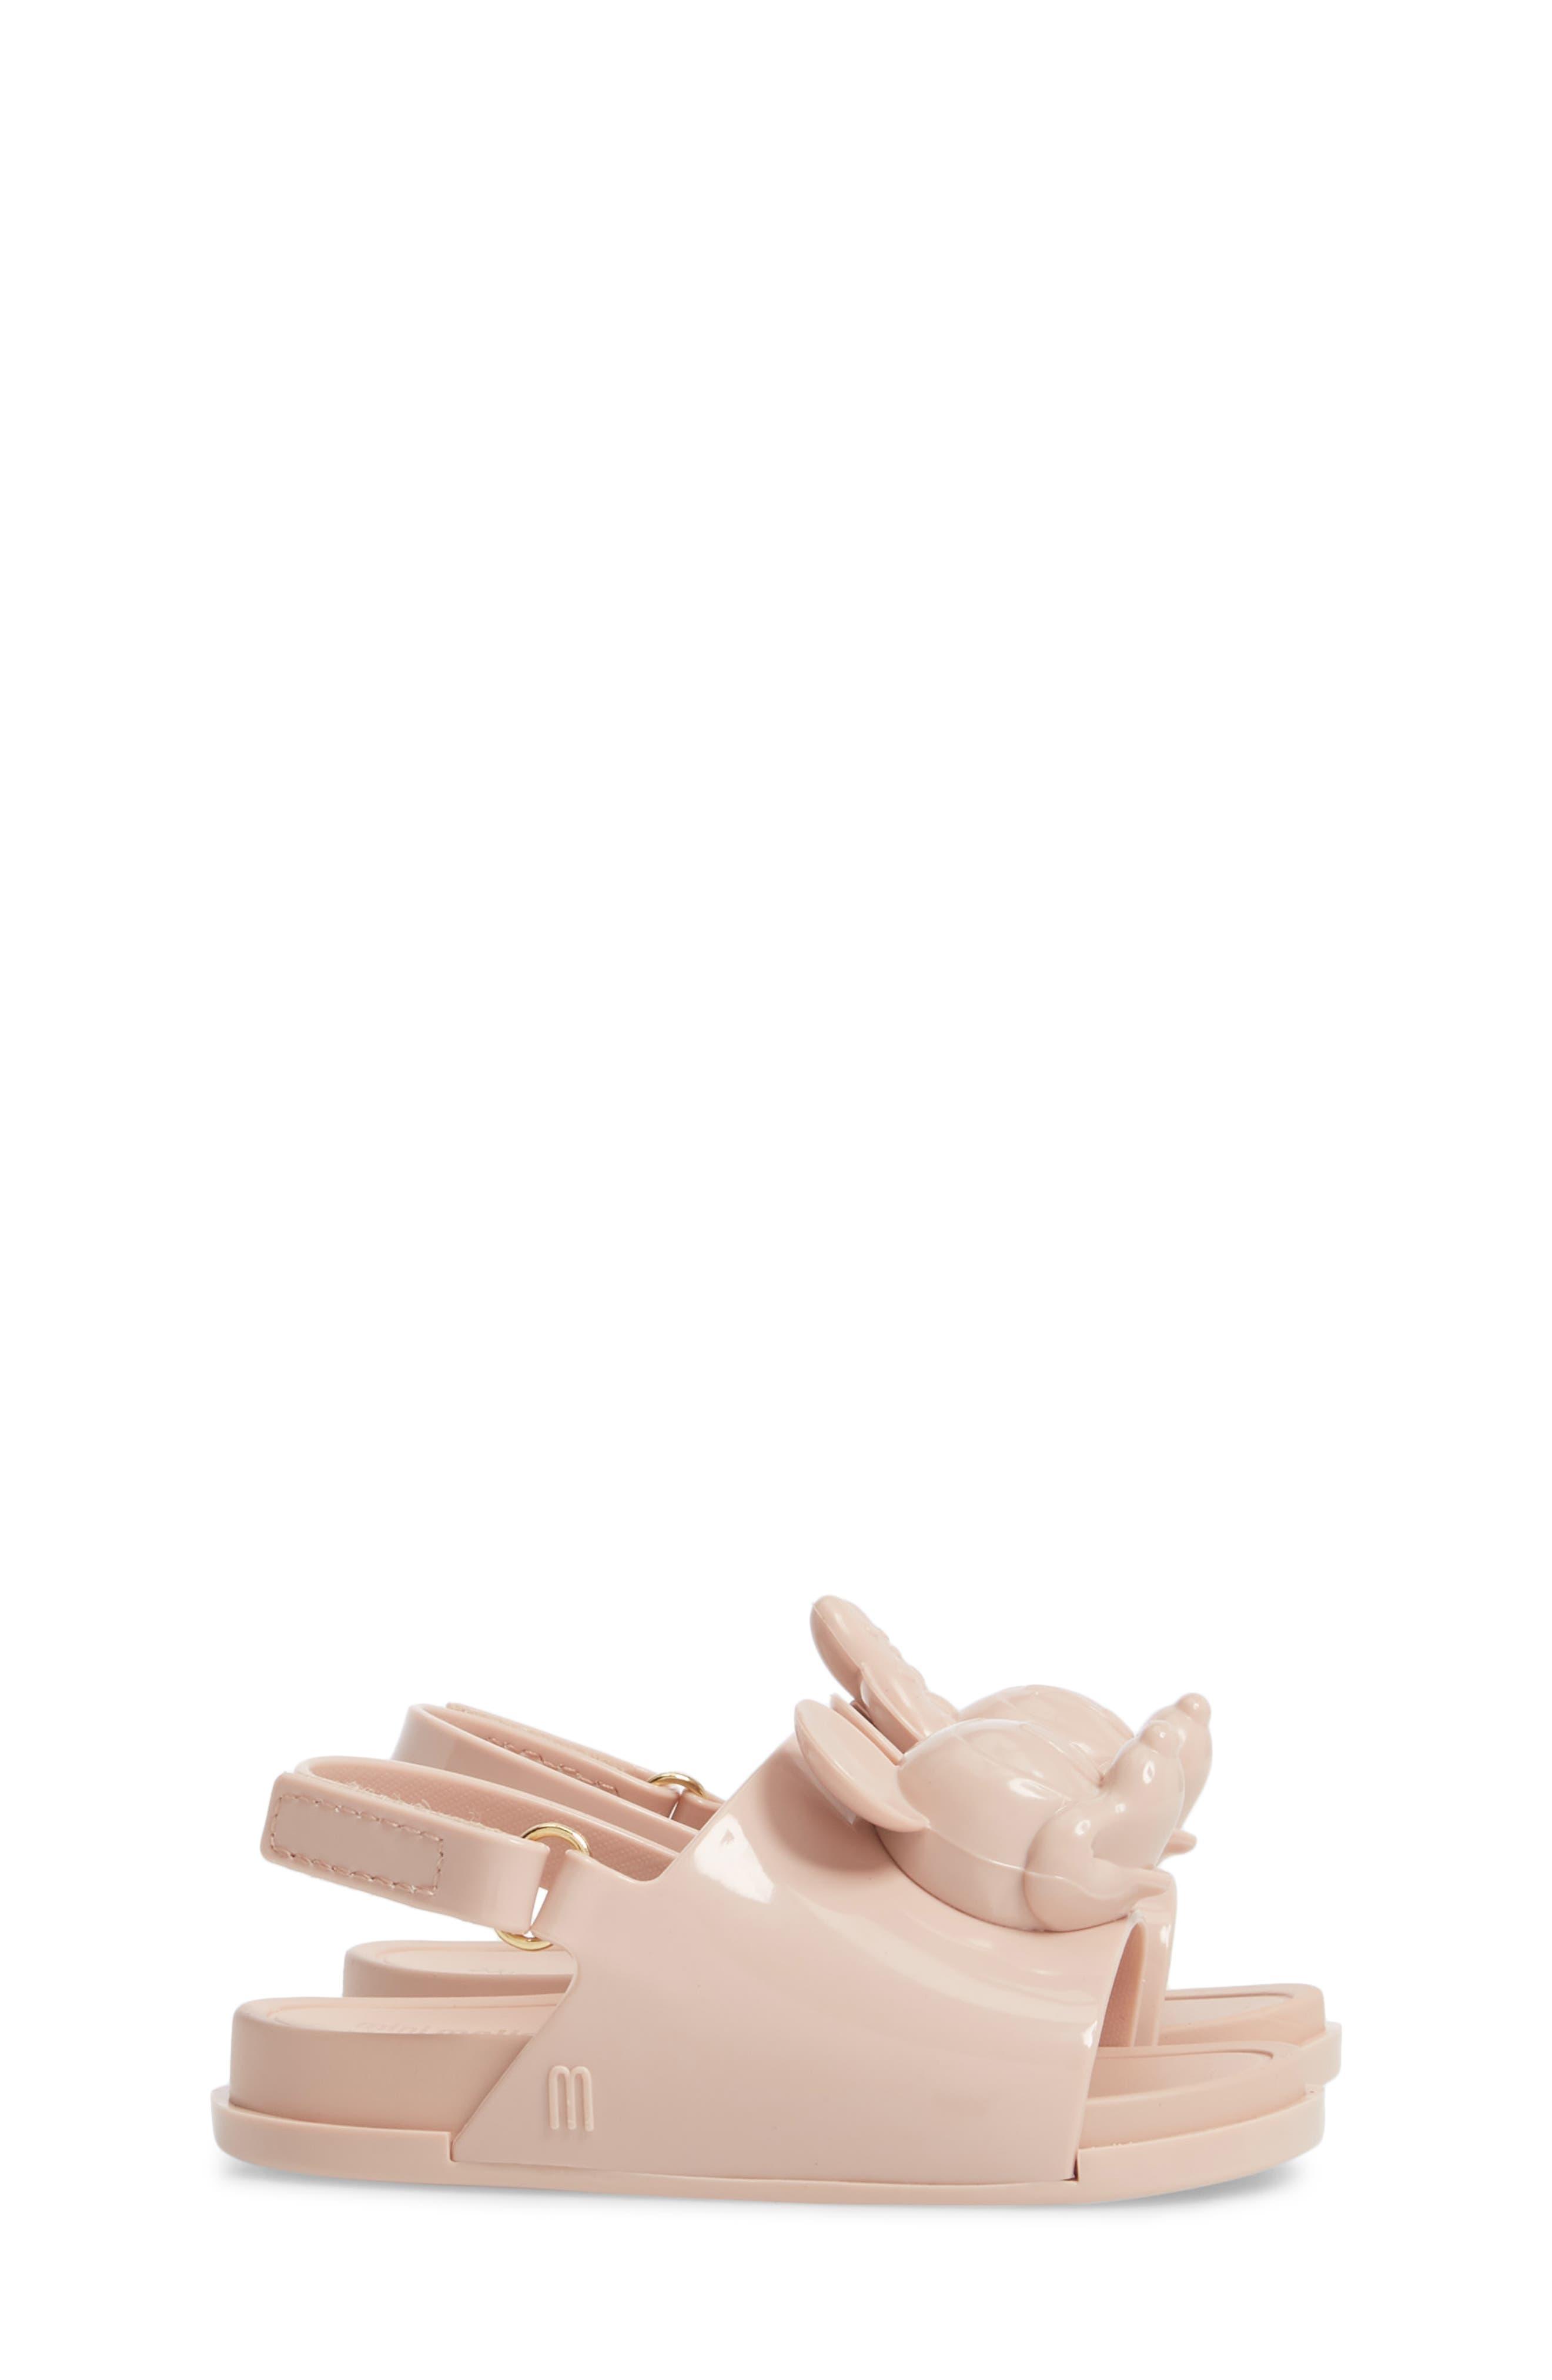 Disney<sup>®</sup> Mini Beach Sandal,                             Alternate thumbnail 12, color,